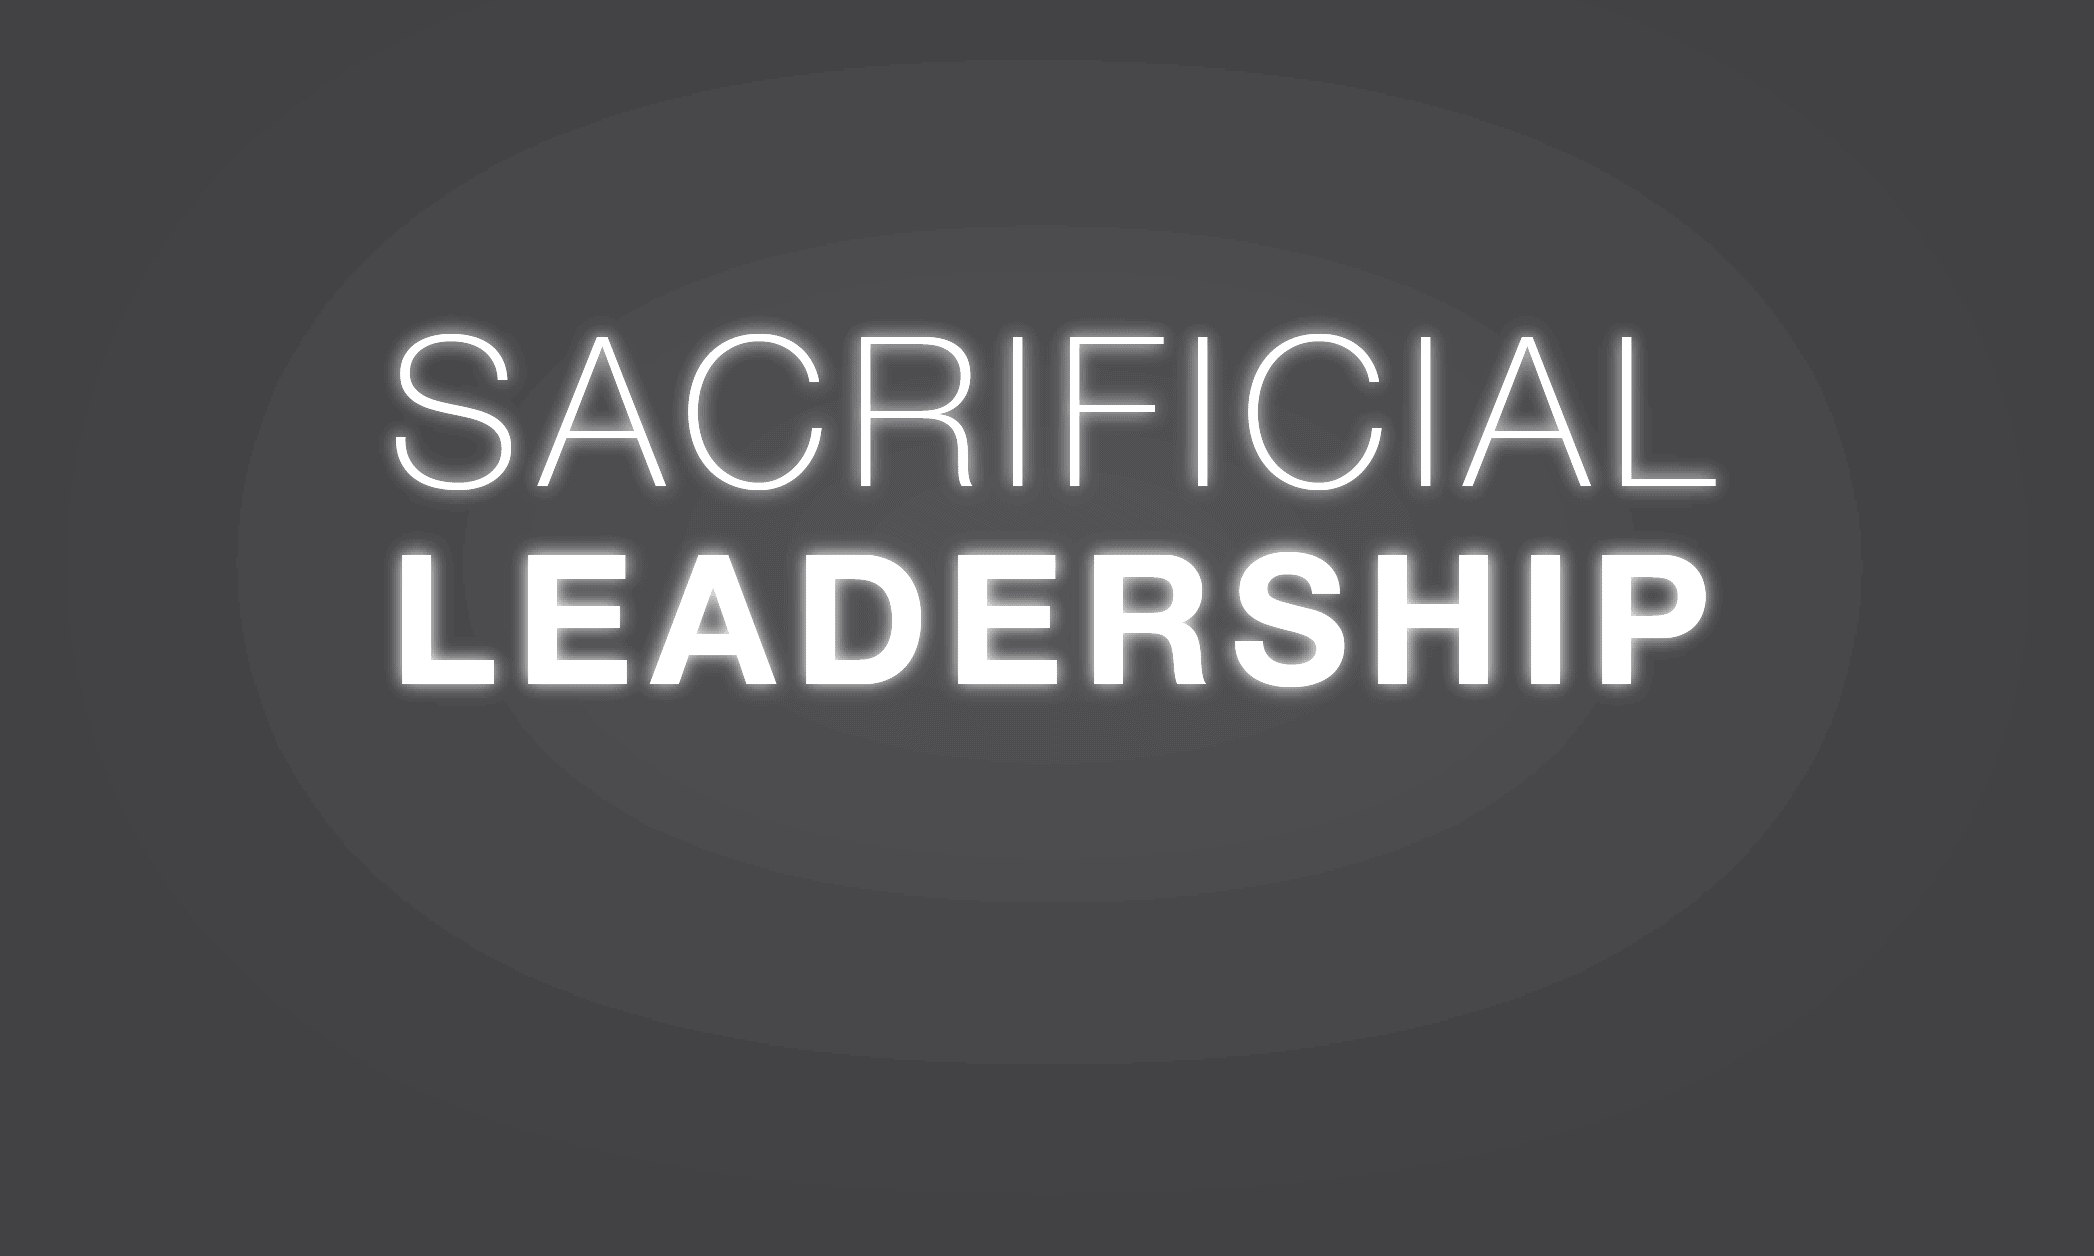 Sacrificial Leadership